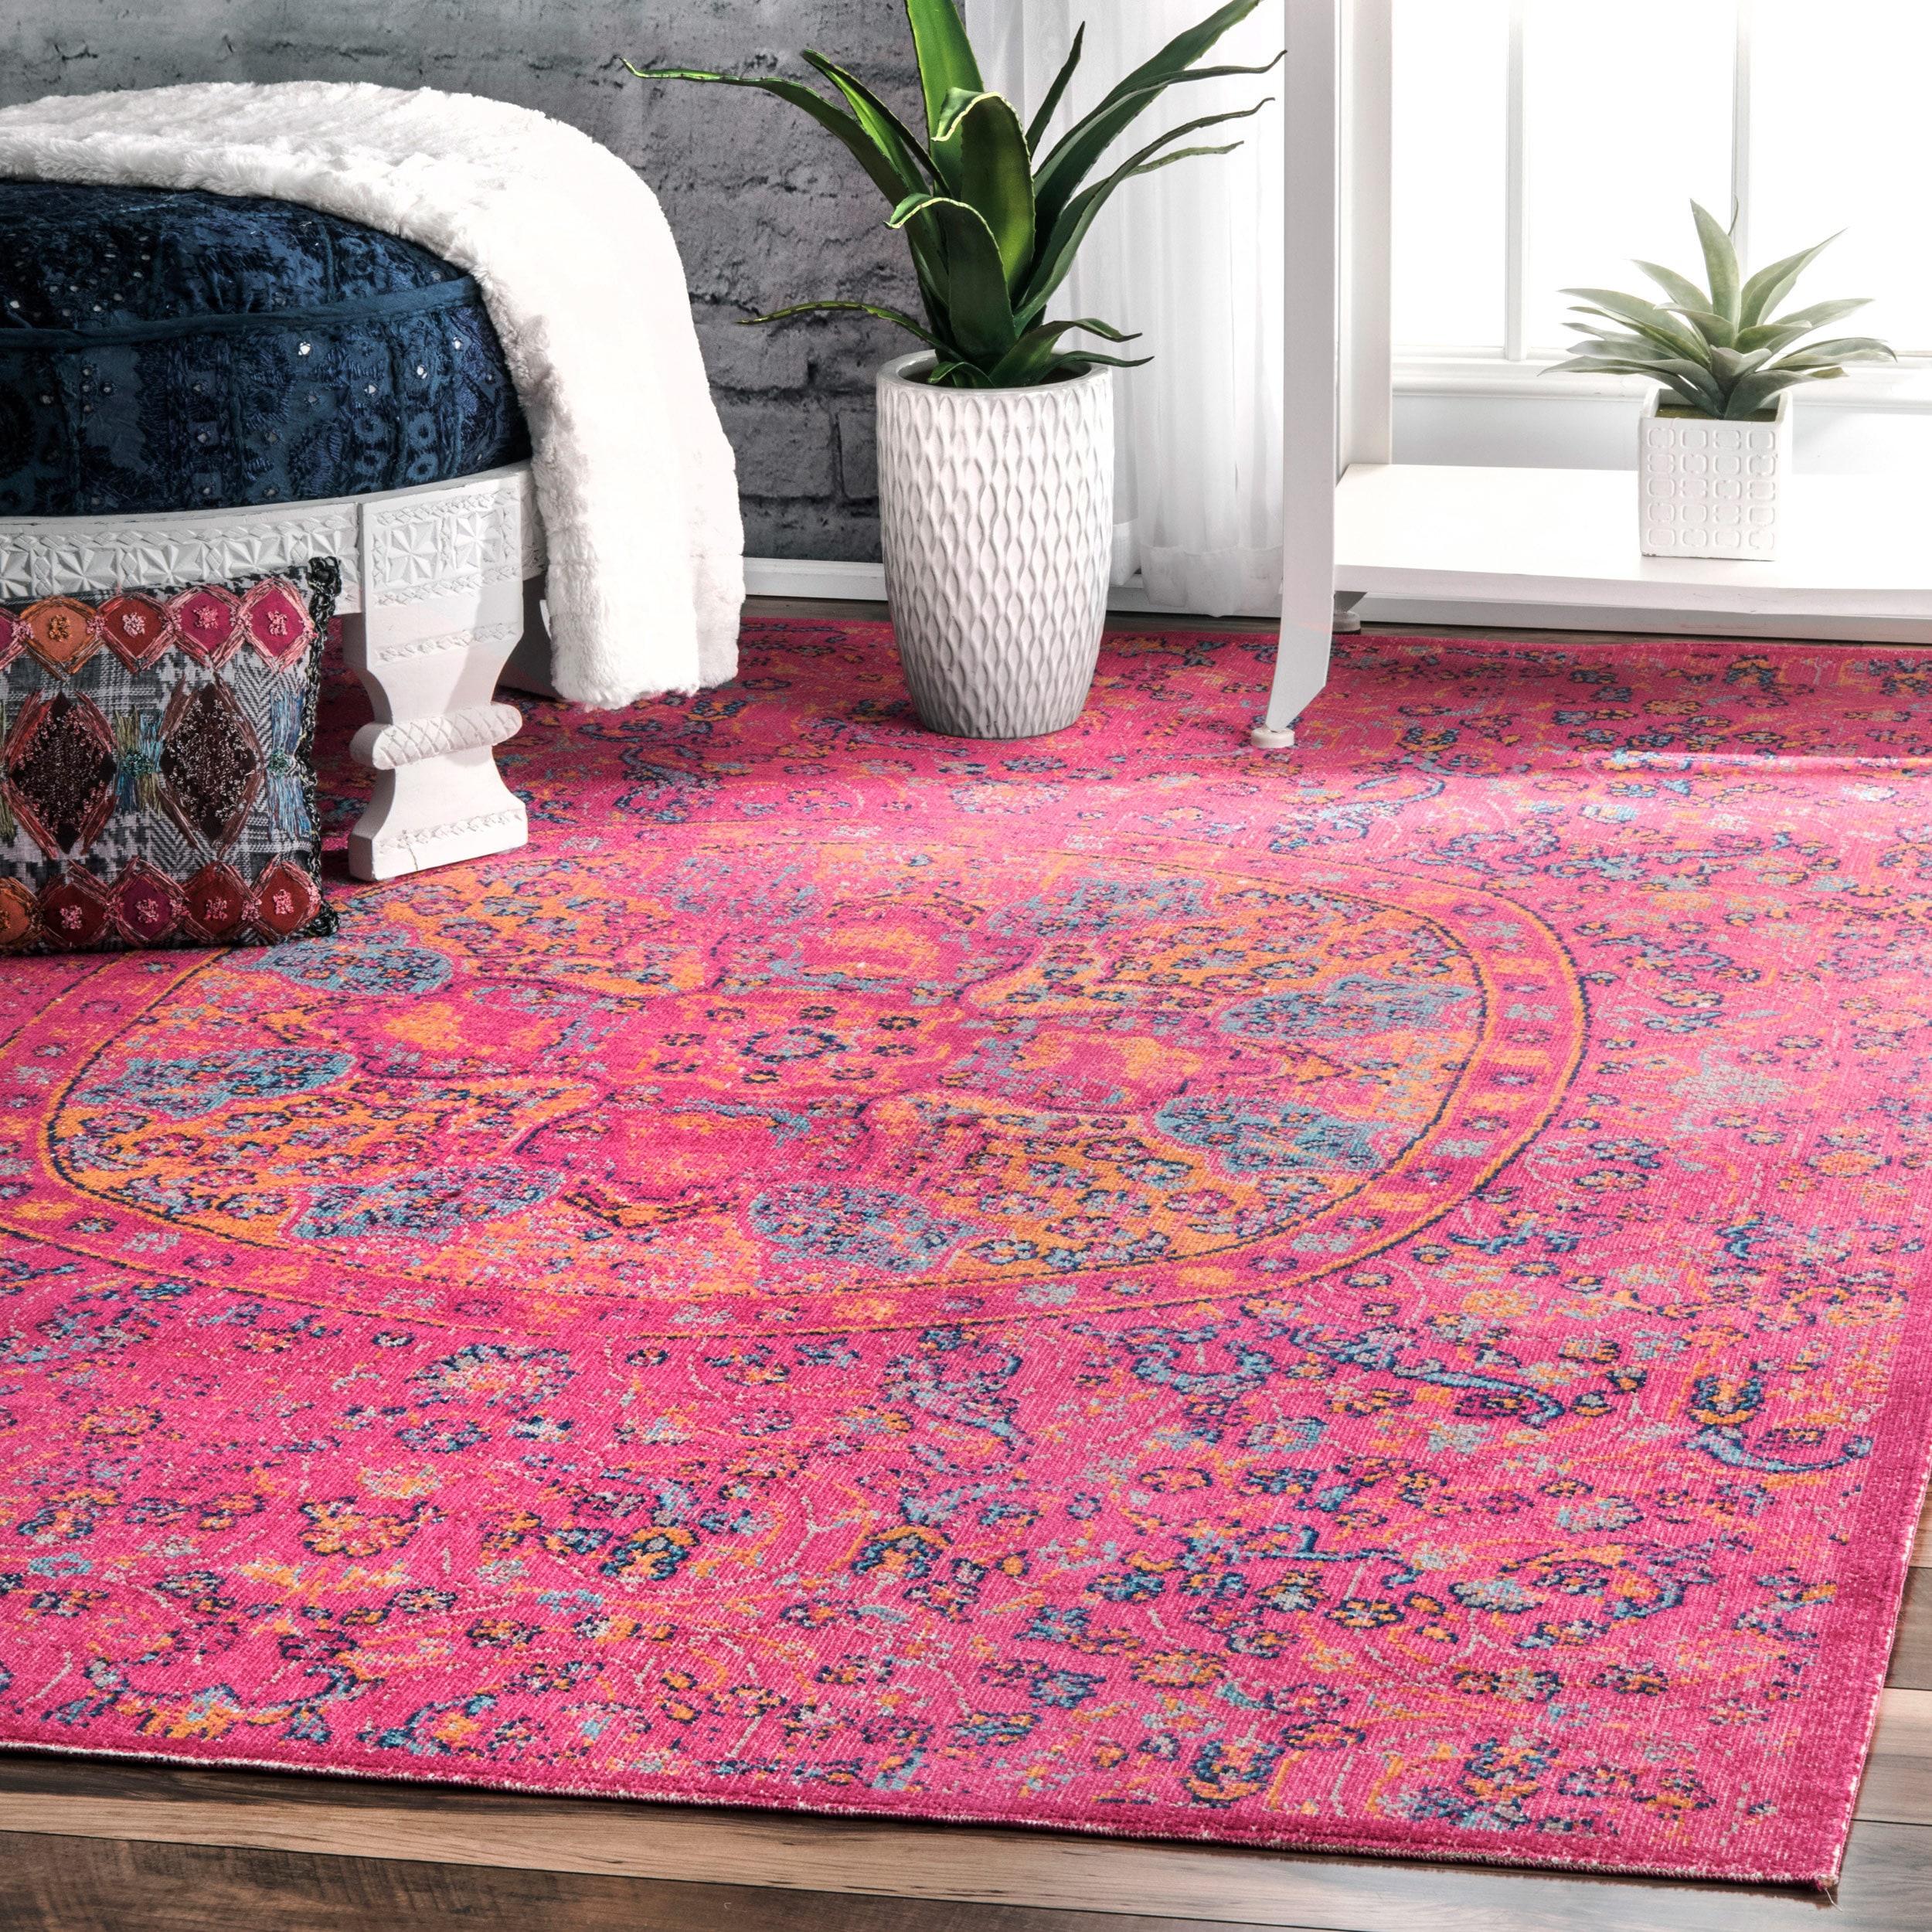 NuLOOM Vintage Floral Mandala Pink Runner Rug (2'6 X 8